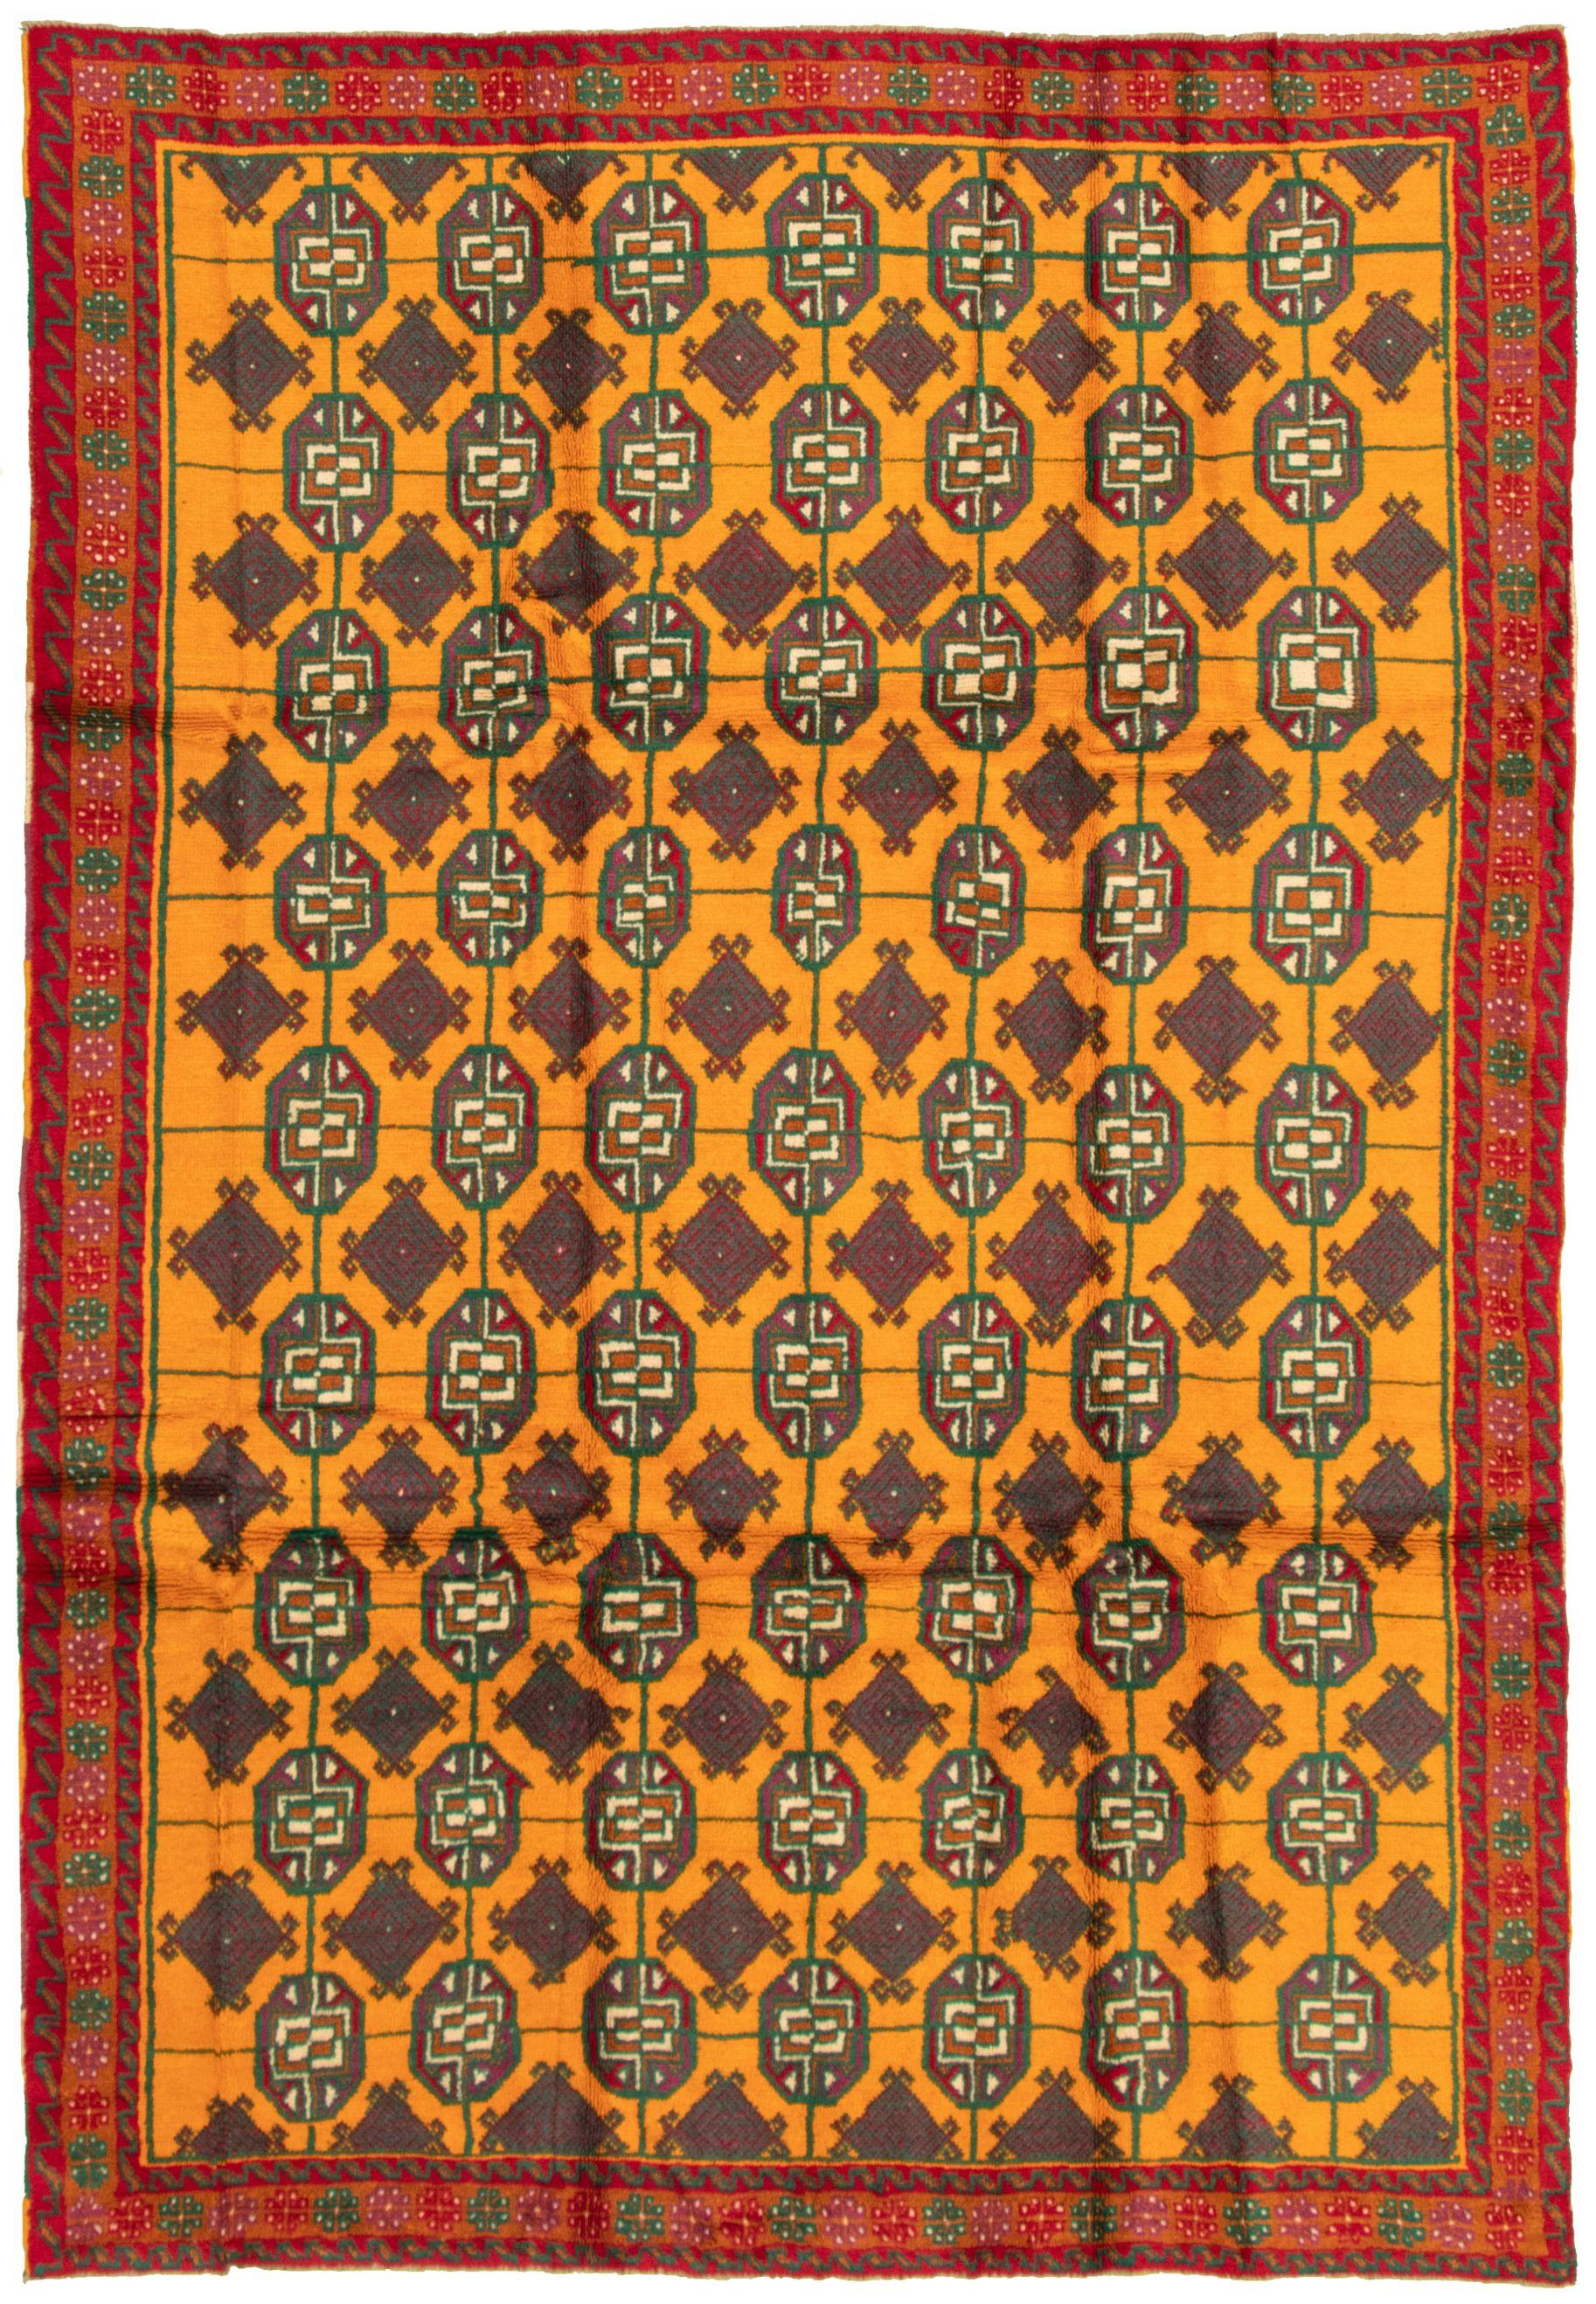 "Hand-knotted Akhjah Light Orange Wool Rug 6'9"" x 9'9"" Size: 6'9"" x 9'9"""